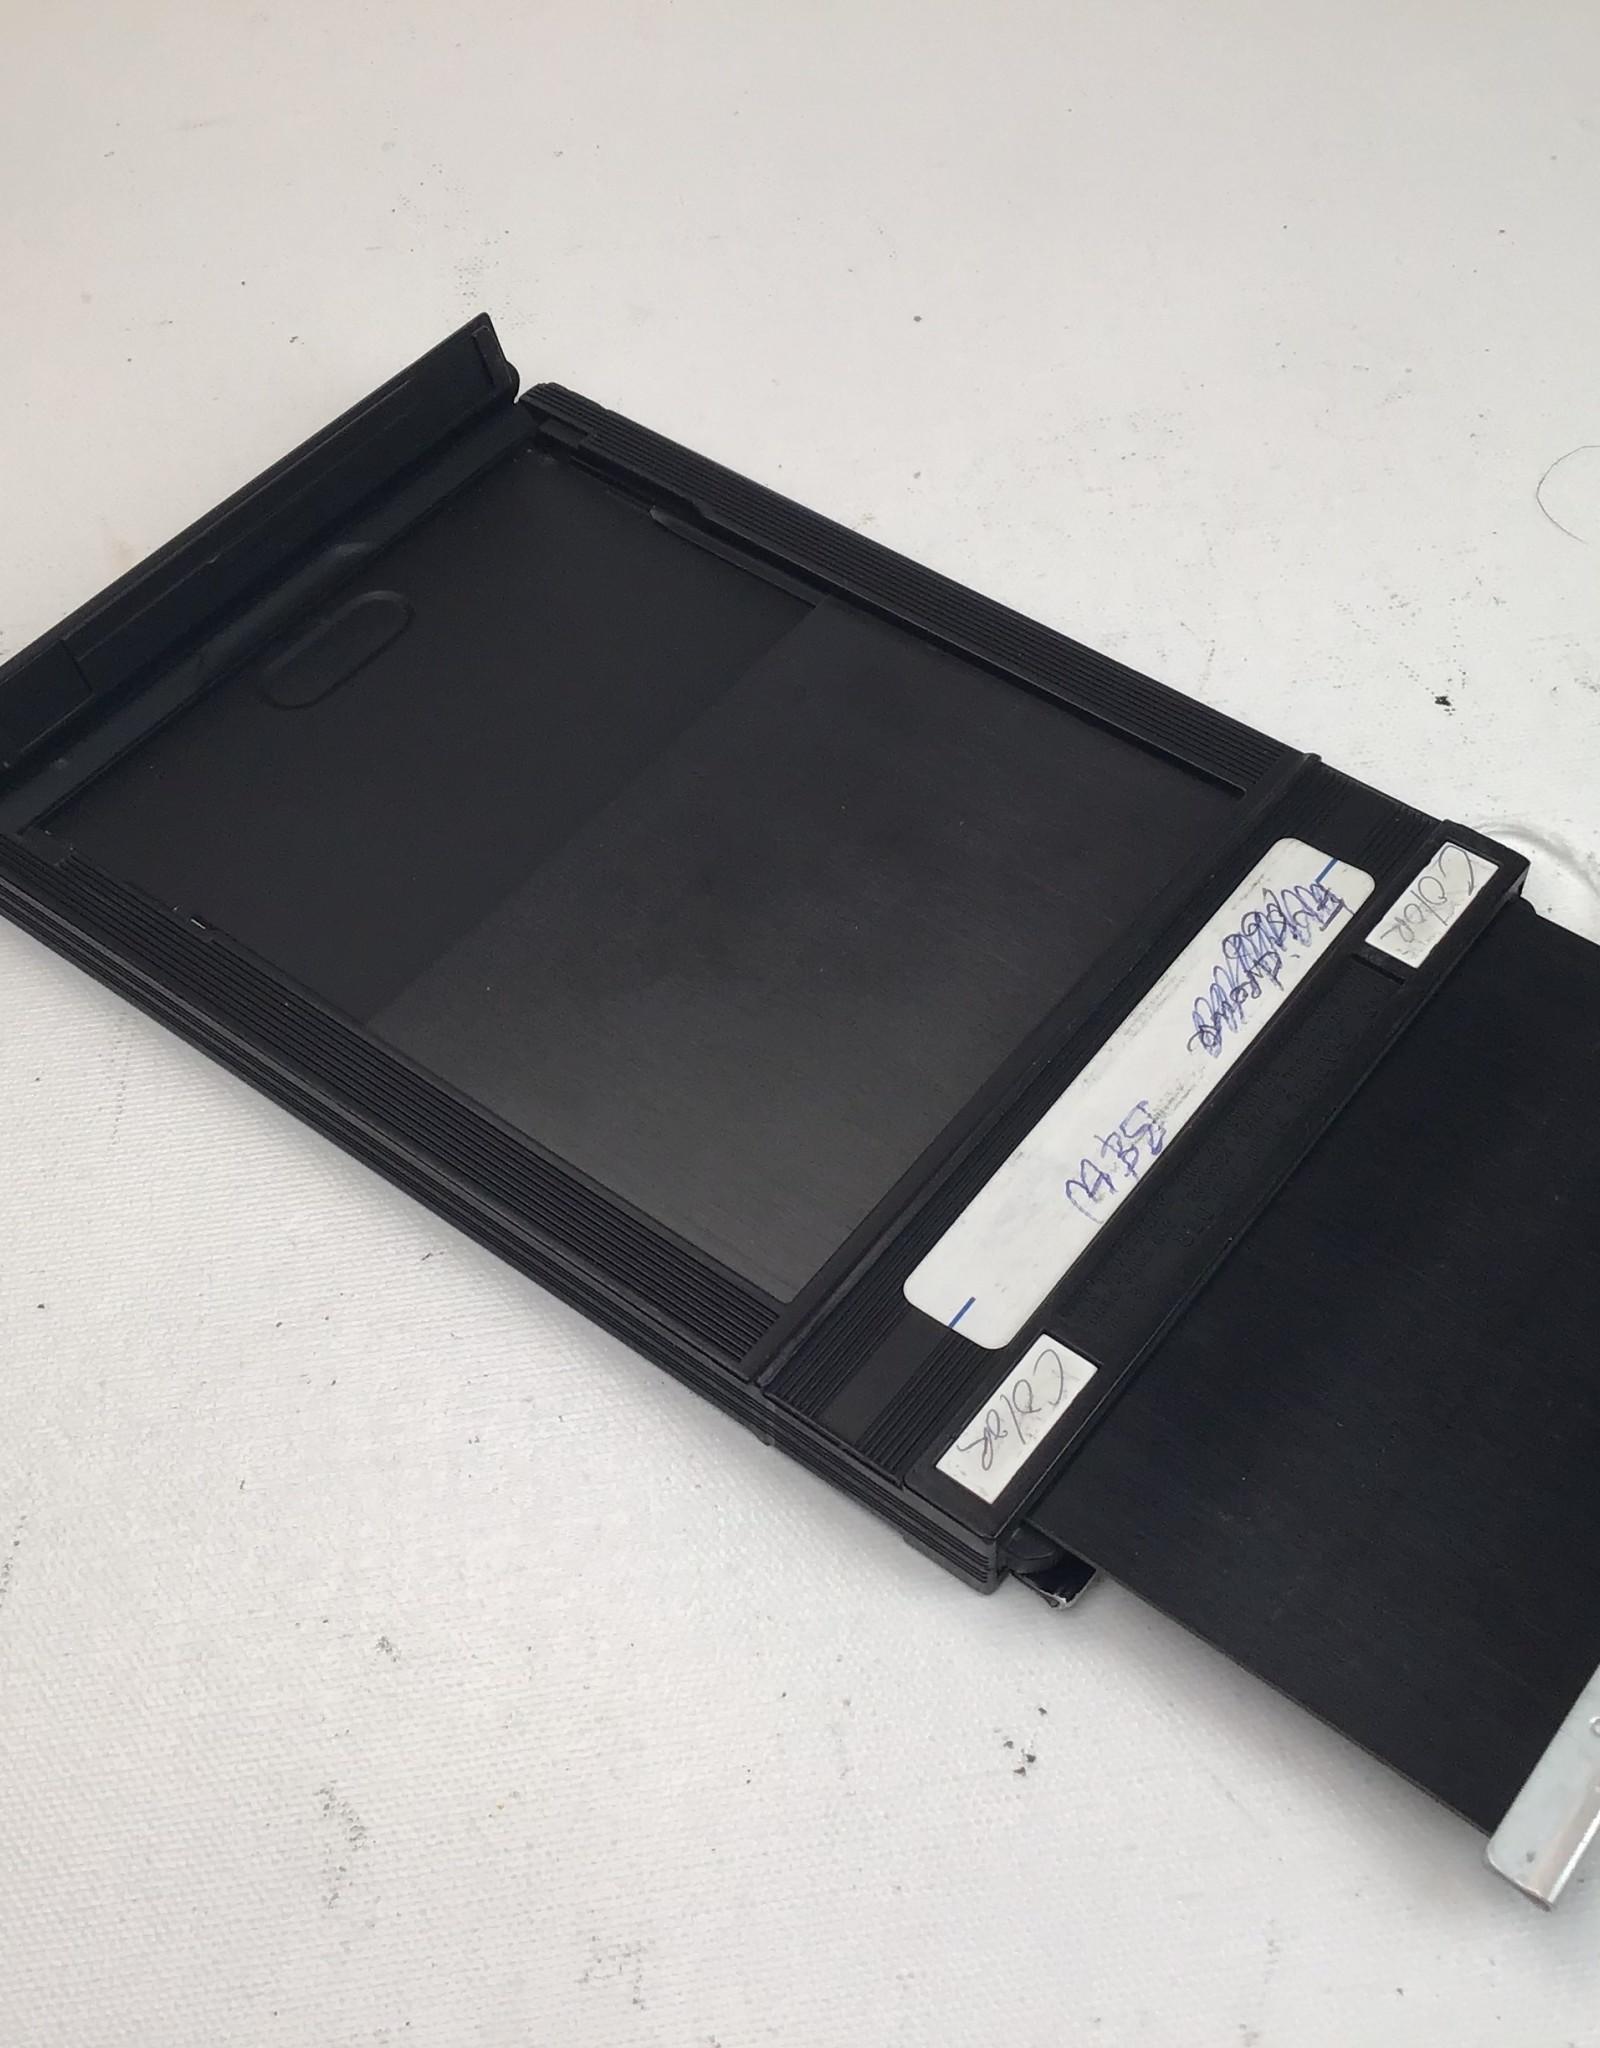 Riteway 4x5 Sheet Film Holder Used Good